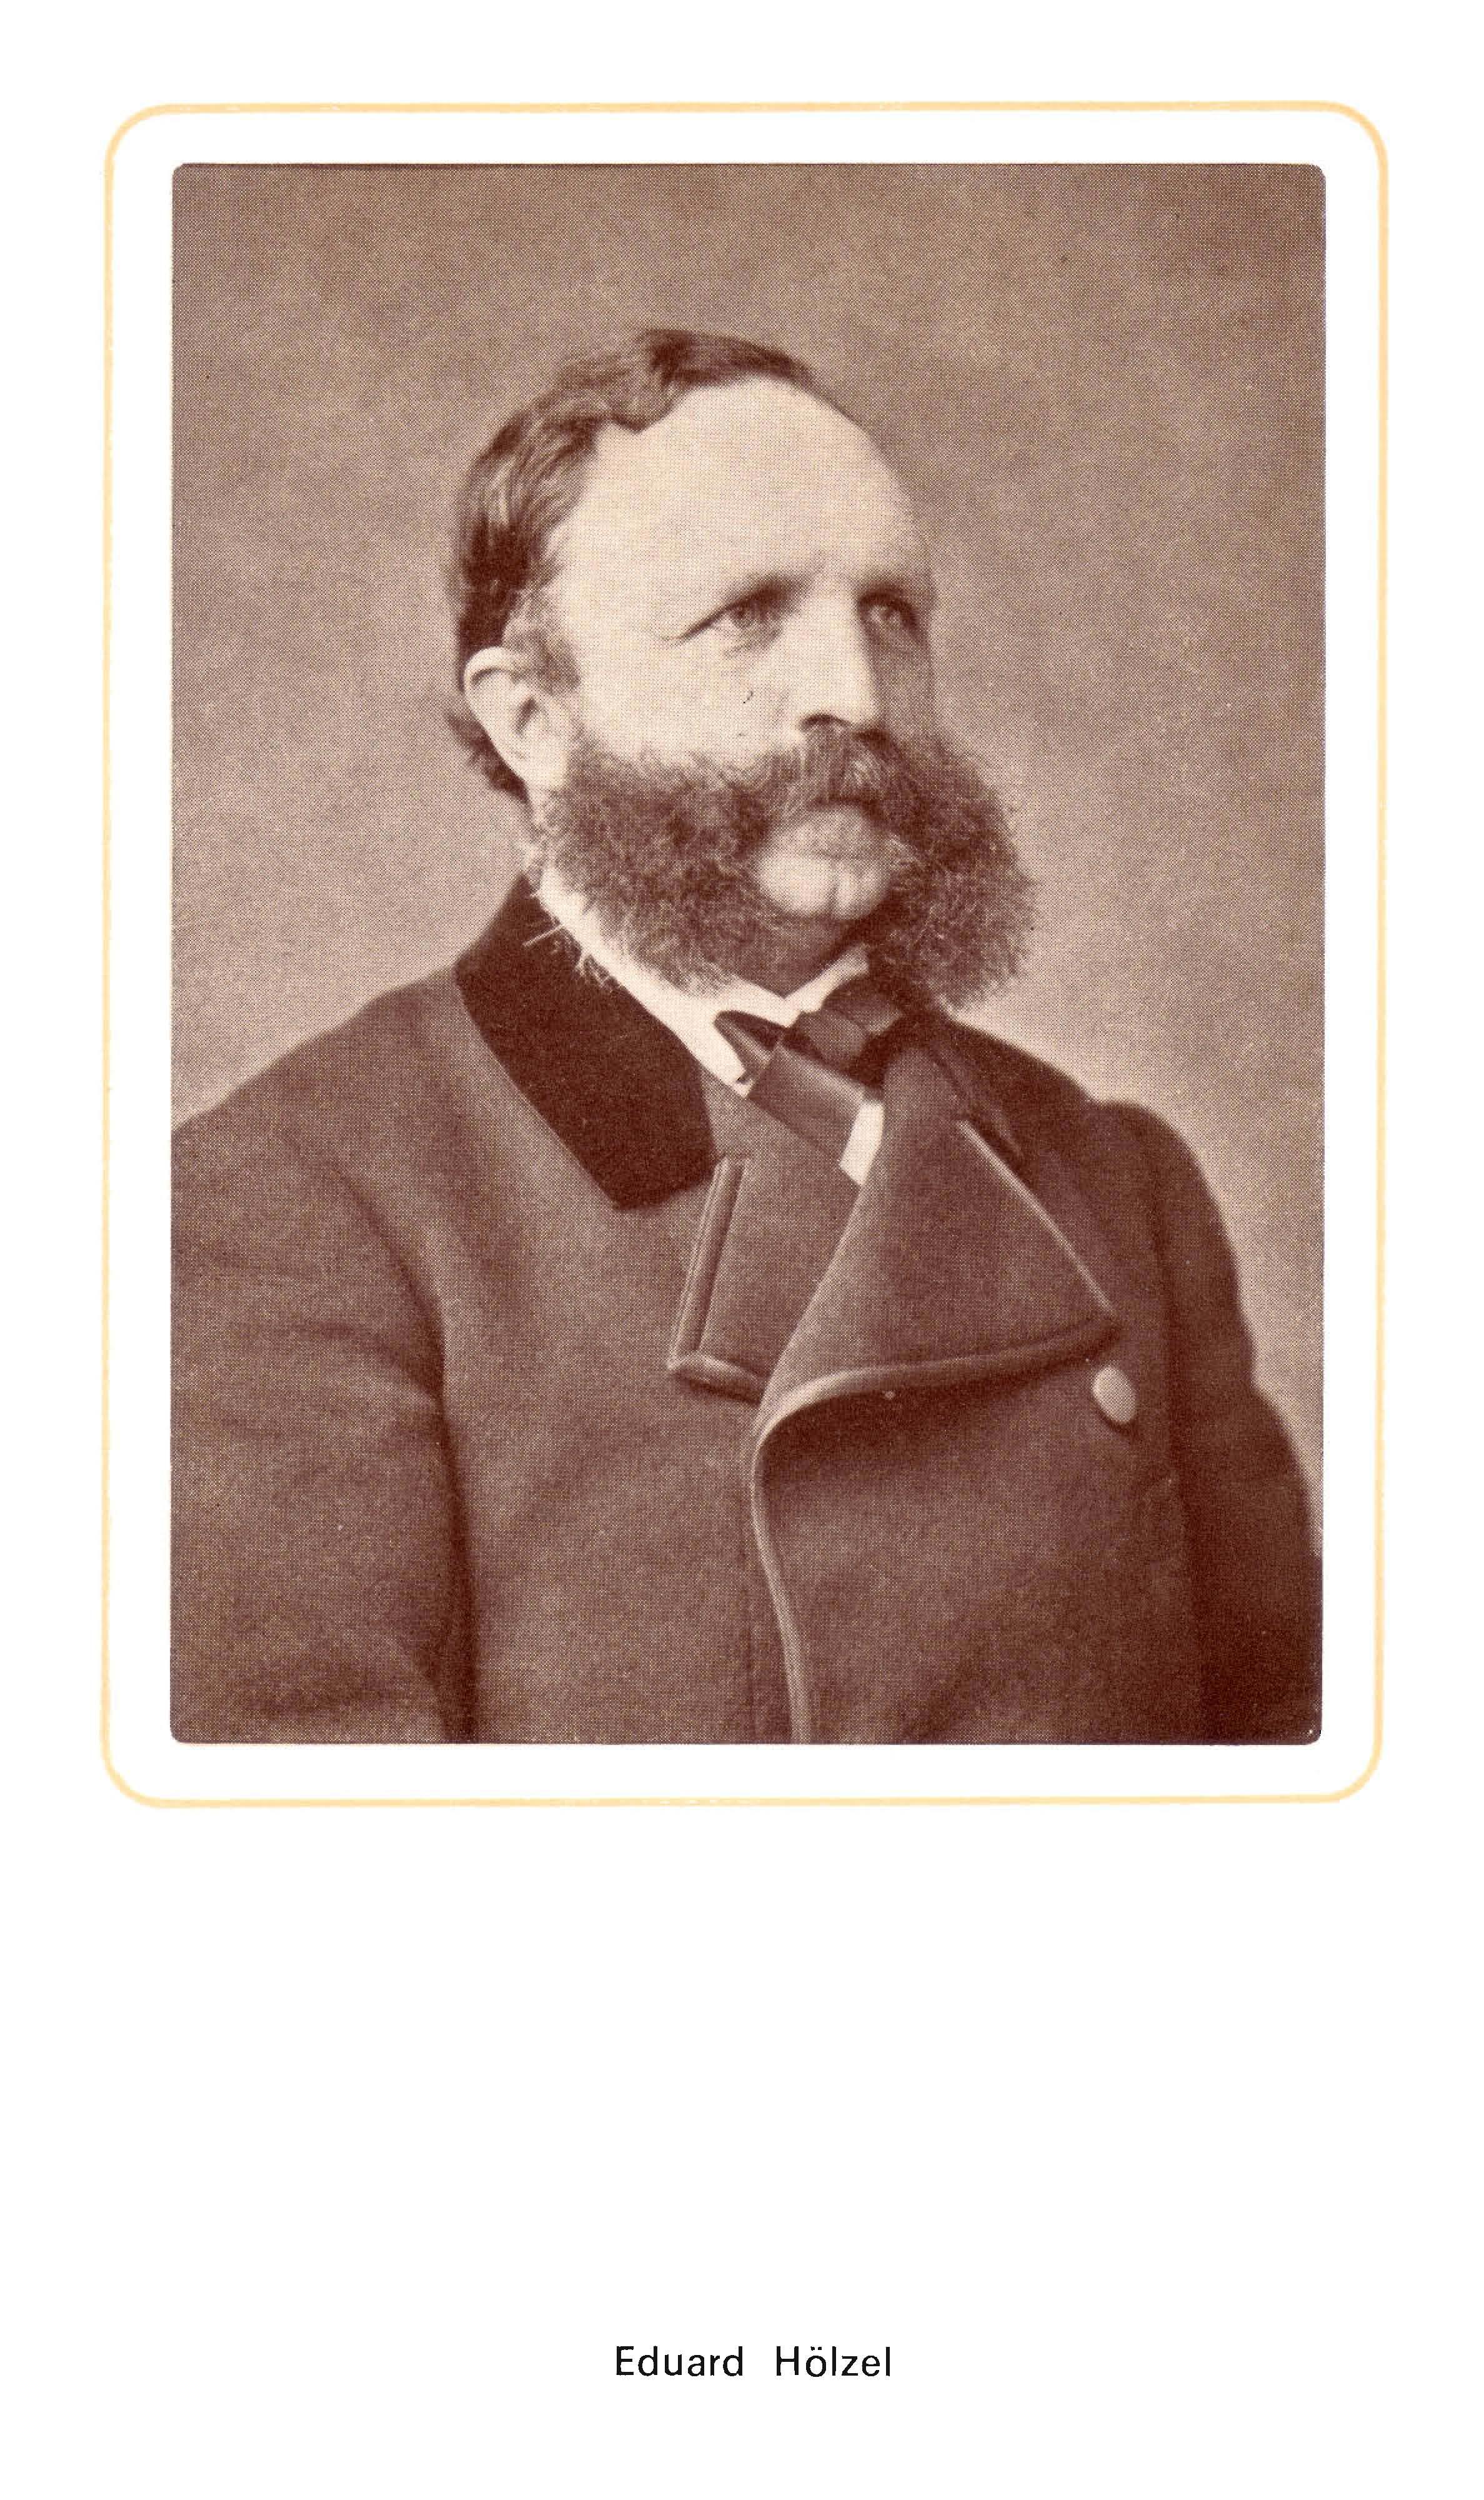 Eduard Hölzel Porträt